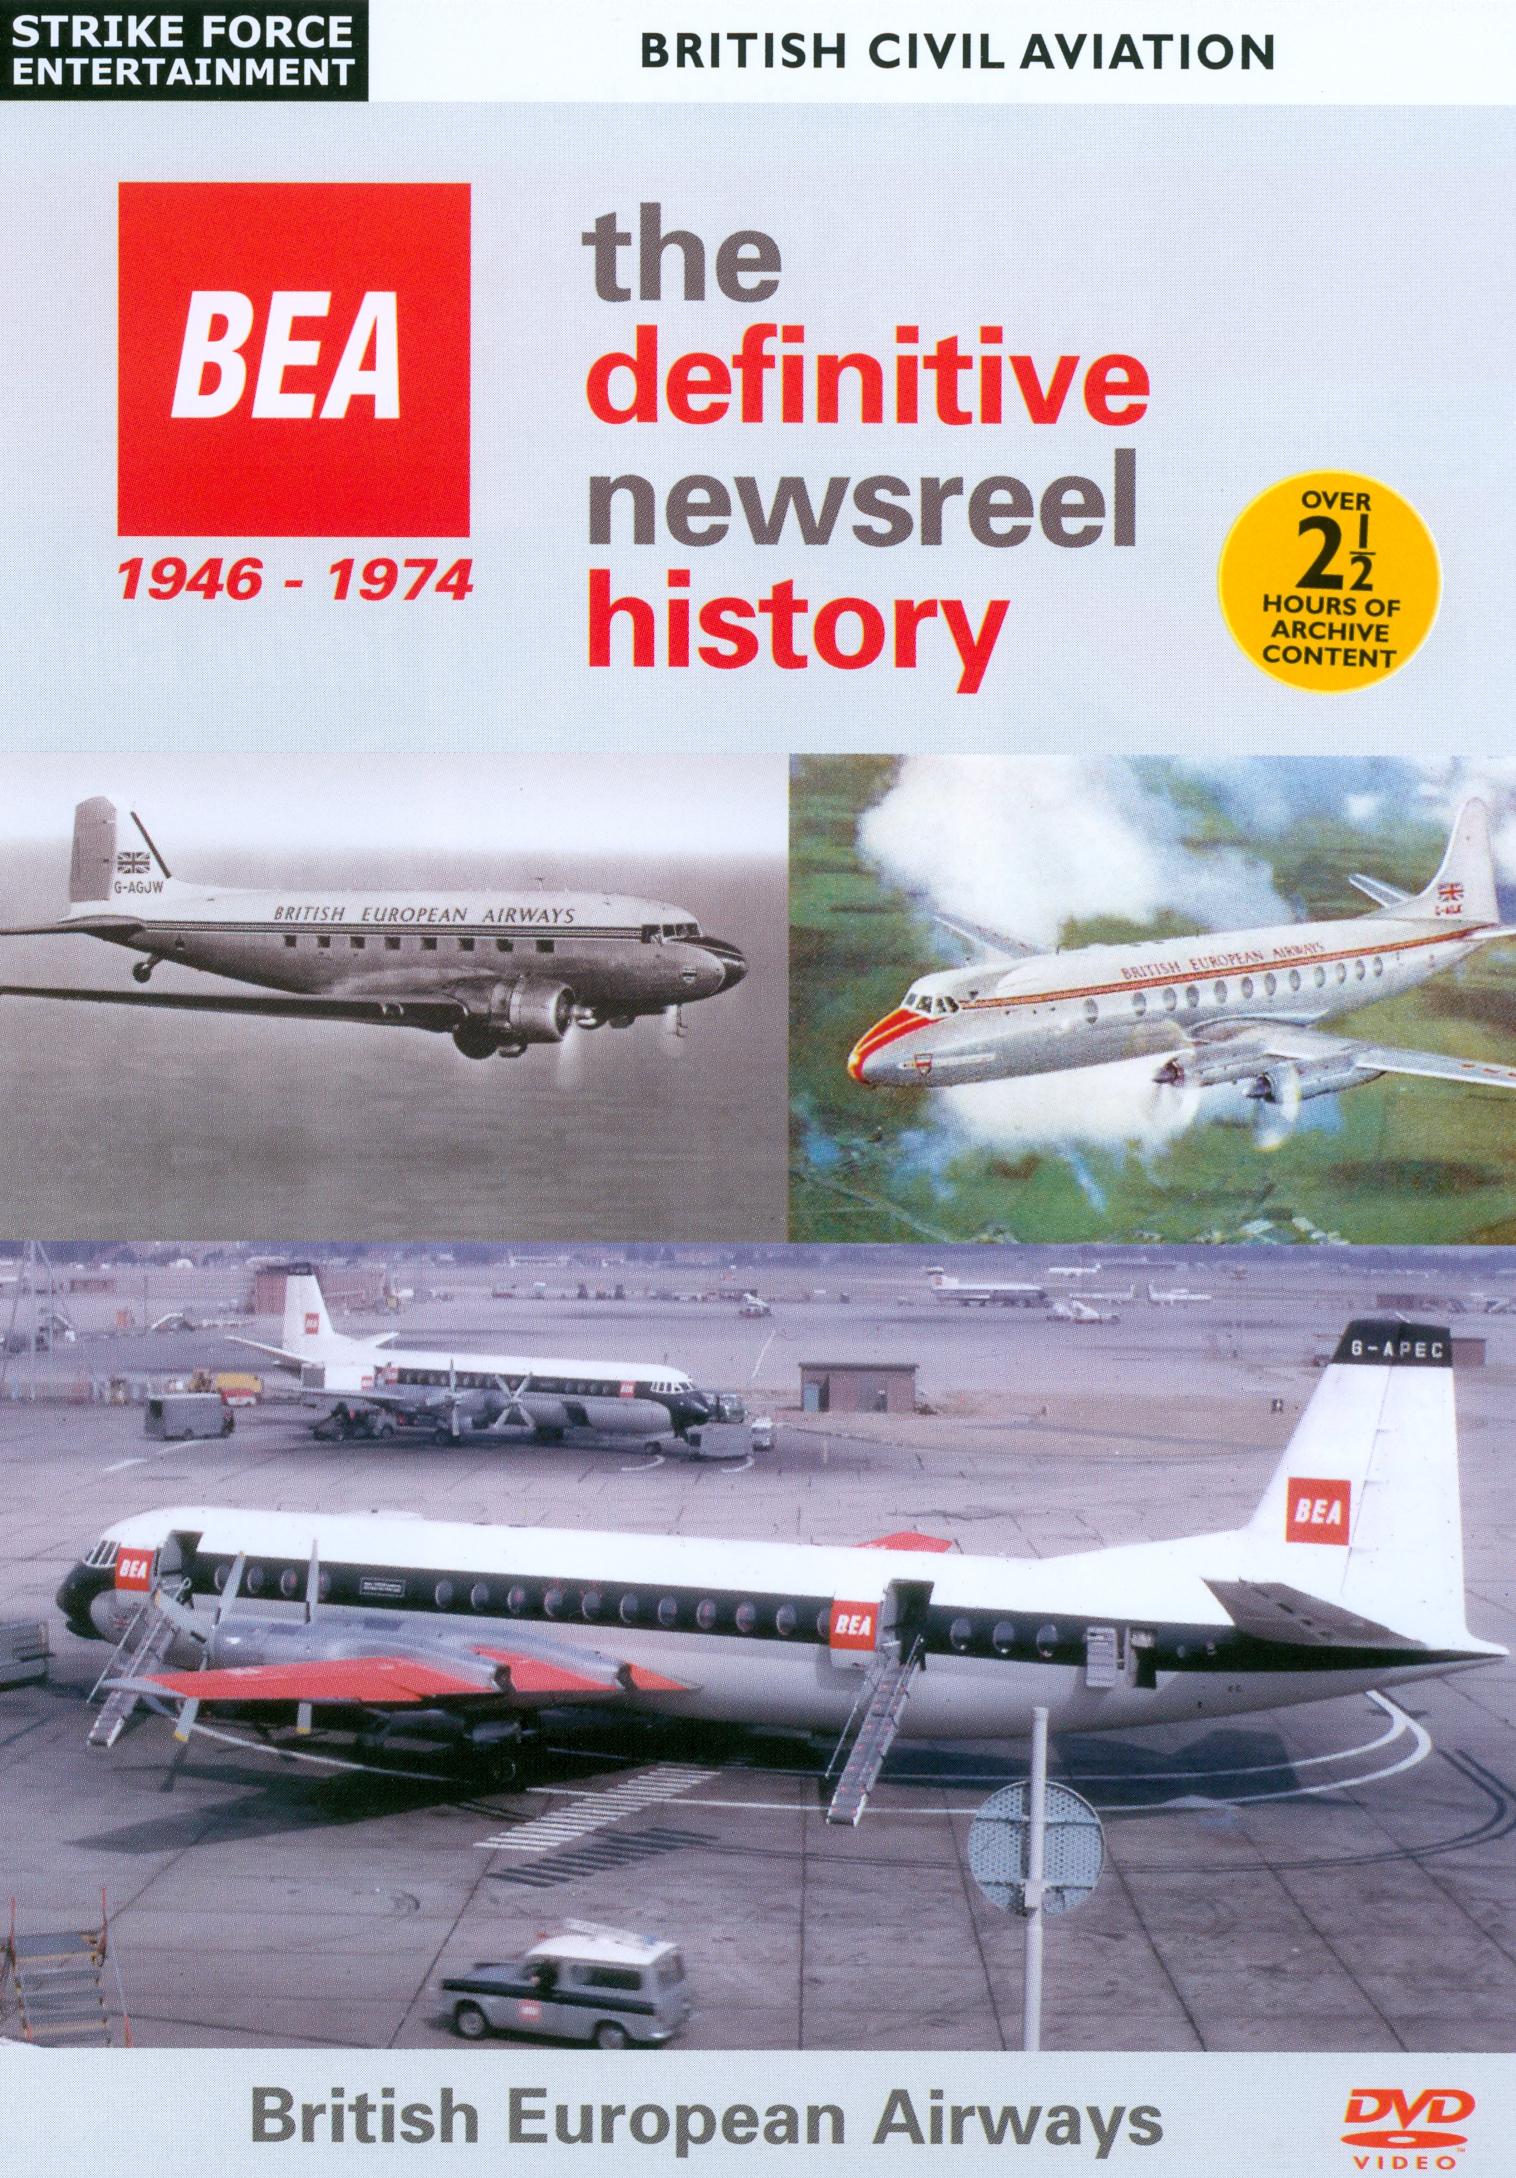 British European Airways: The Definitive Newsreel History 1946-1974